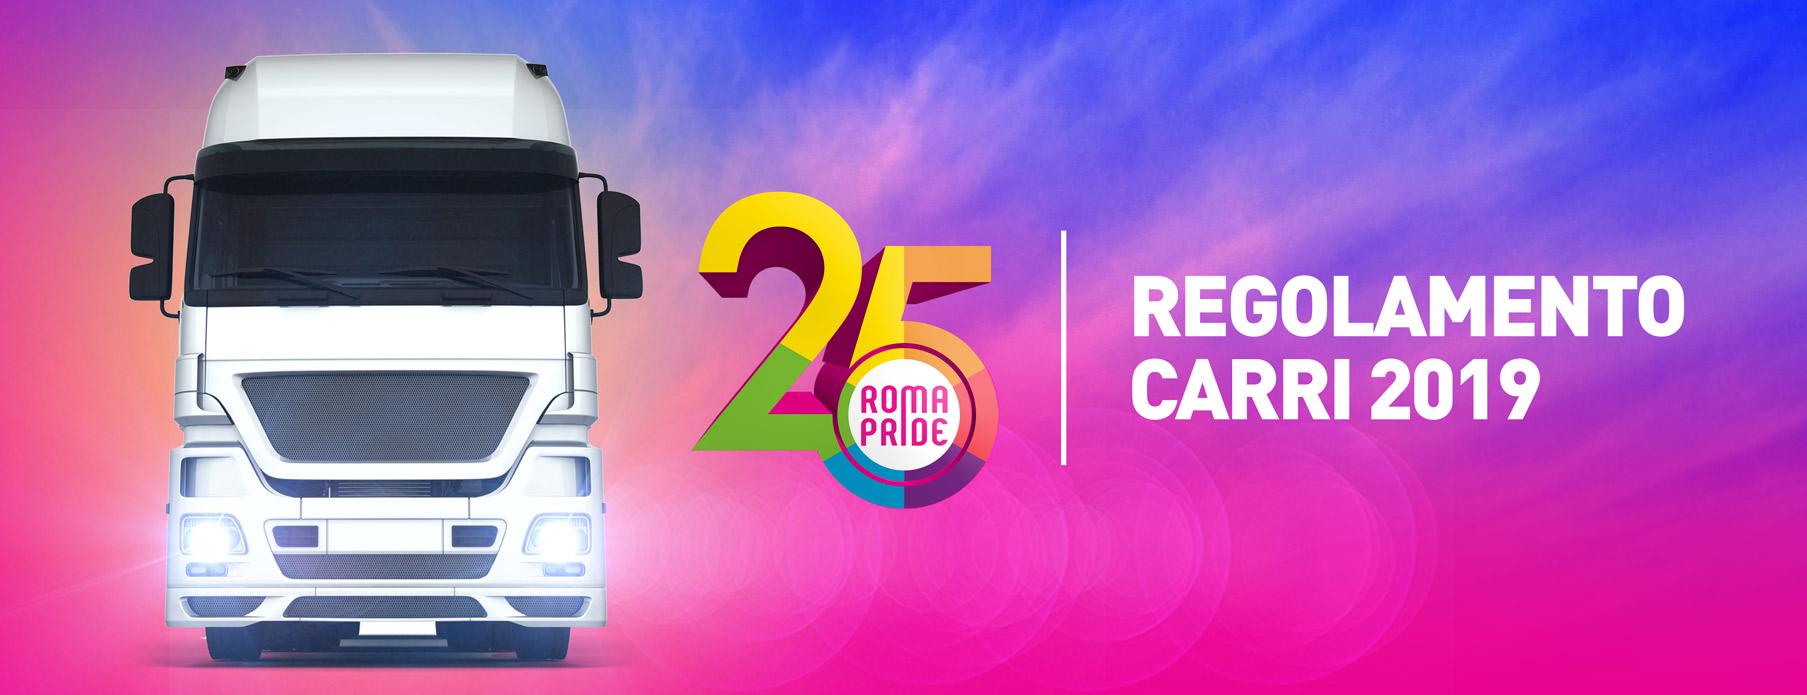 Roma Pride 2019 - Regolamento Carri